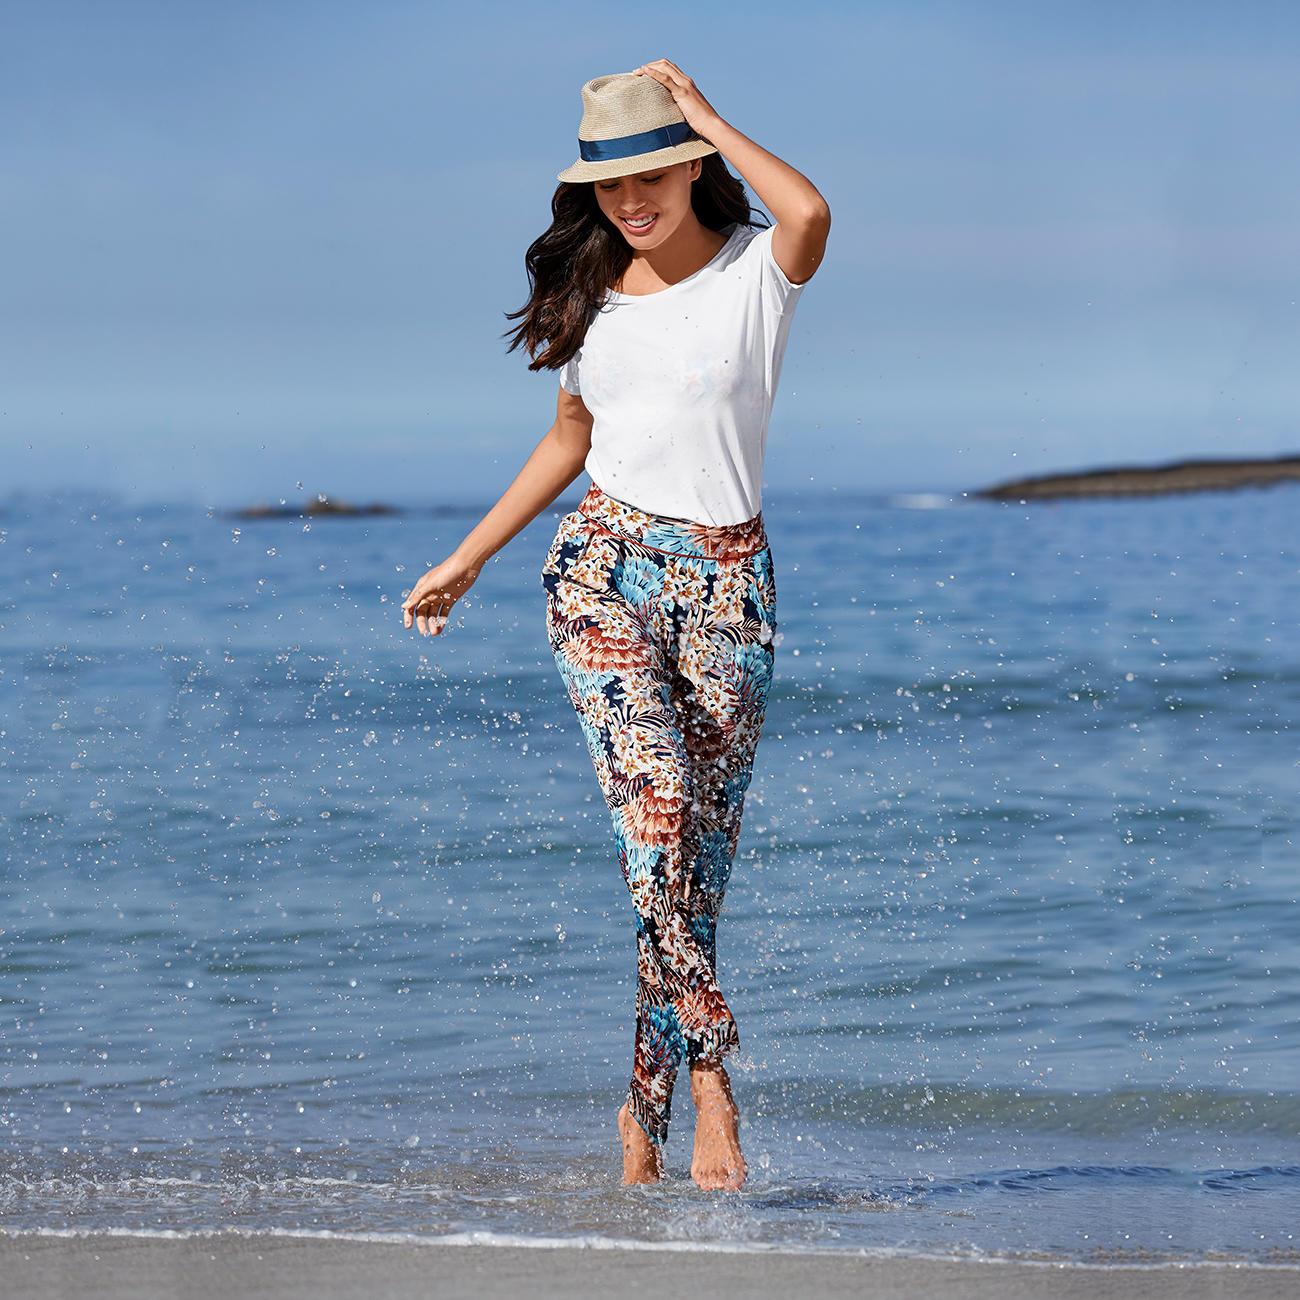 Plage Bikini Pantalon Ou Skiny Découvrir Tahiti De CoedBrx